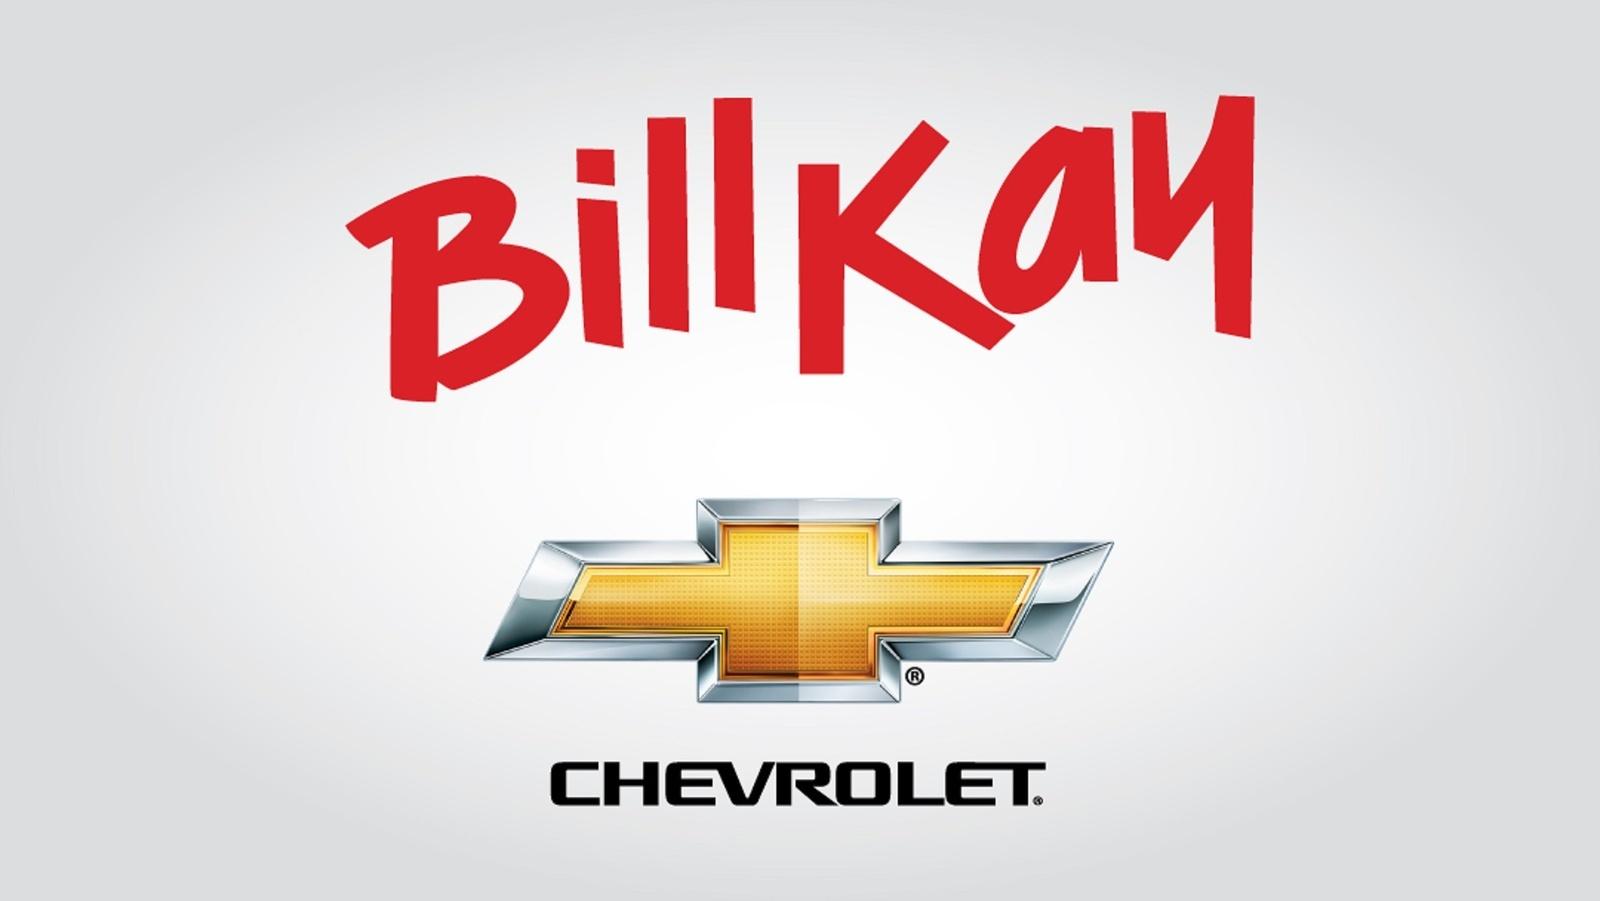 Bill Kay Chevrolet - Lisle, IL: Read Consumer reviews ...